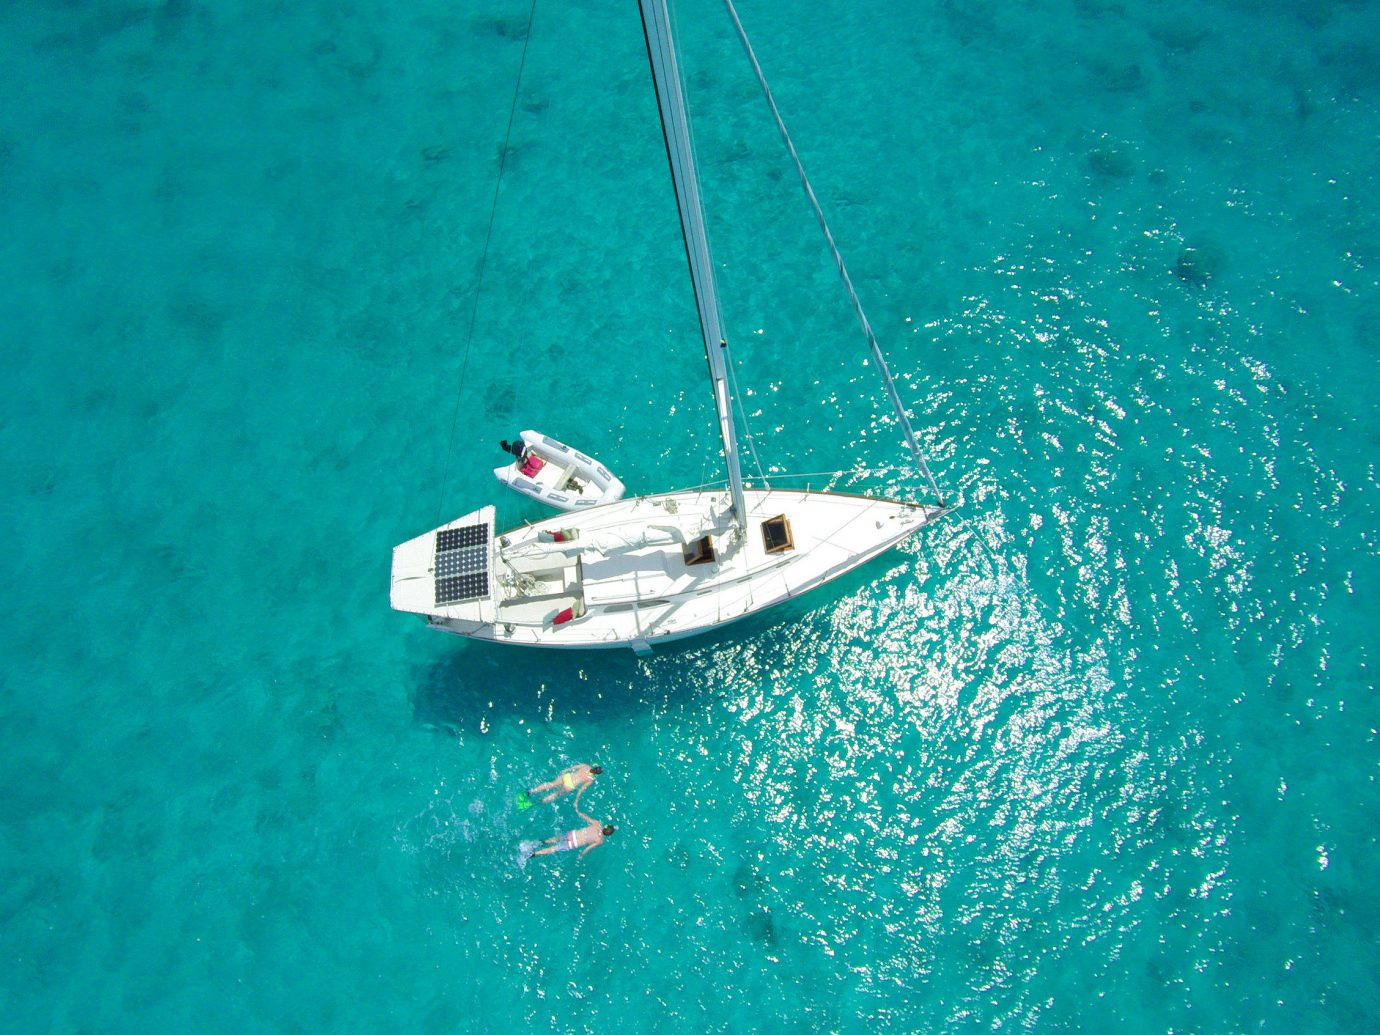 Beach water blue Boat Sea vehicle Sport Ocean watercraft rowing reflection wave watercraft underwater